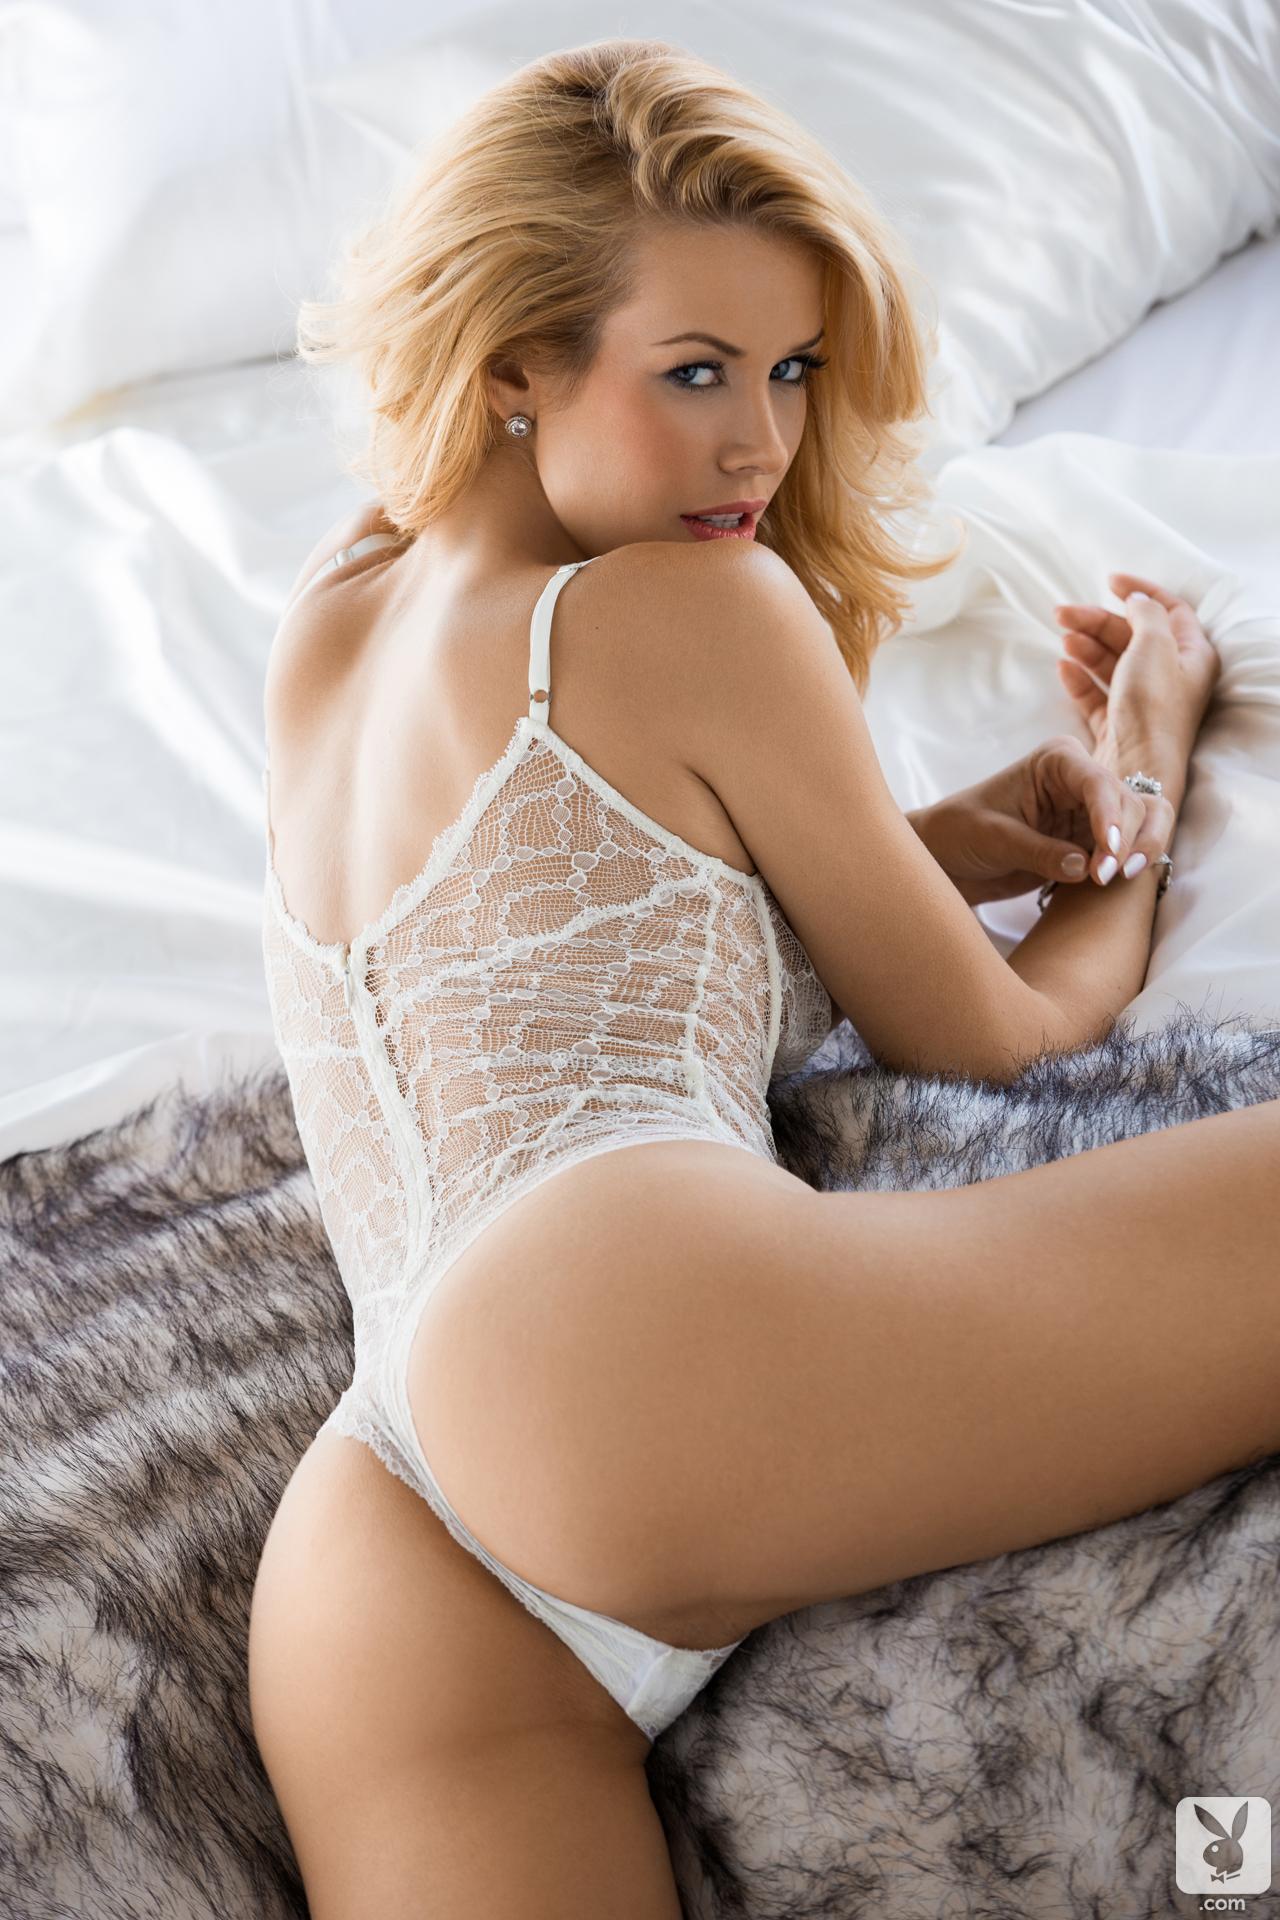 Busty dream girl nude